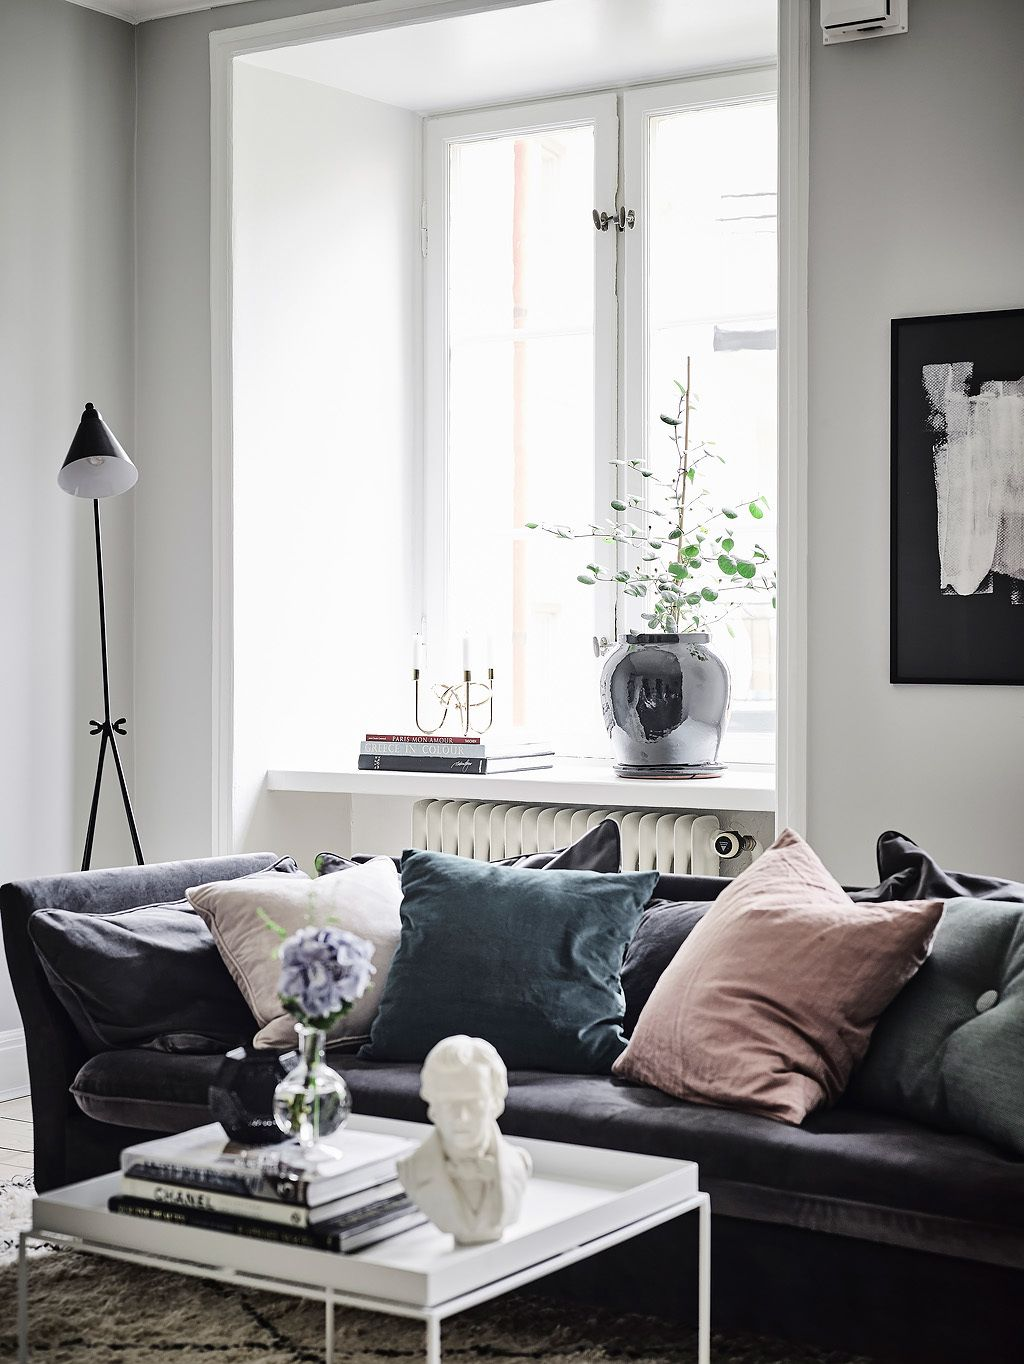 Pin by ana flávia on decor pinterest scandinavian living rooms